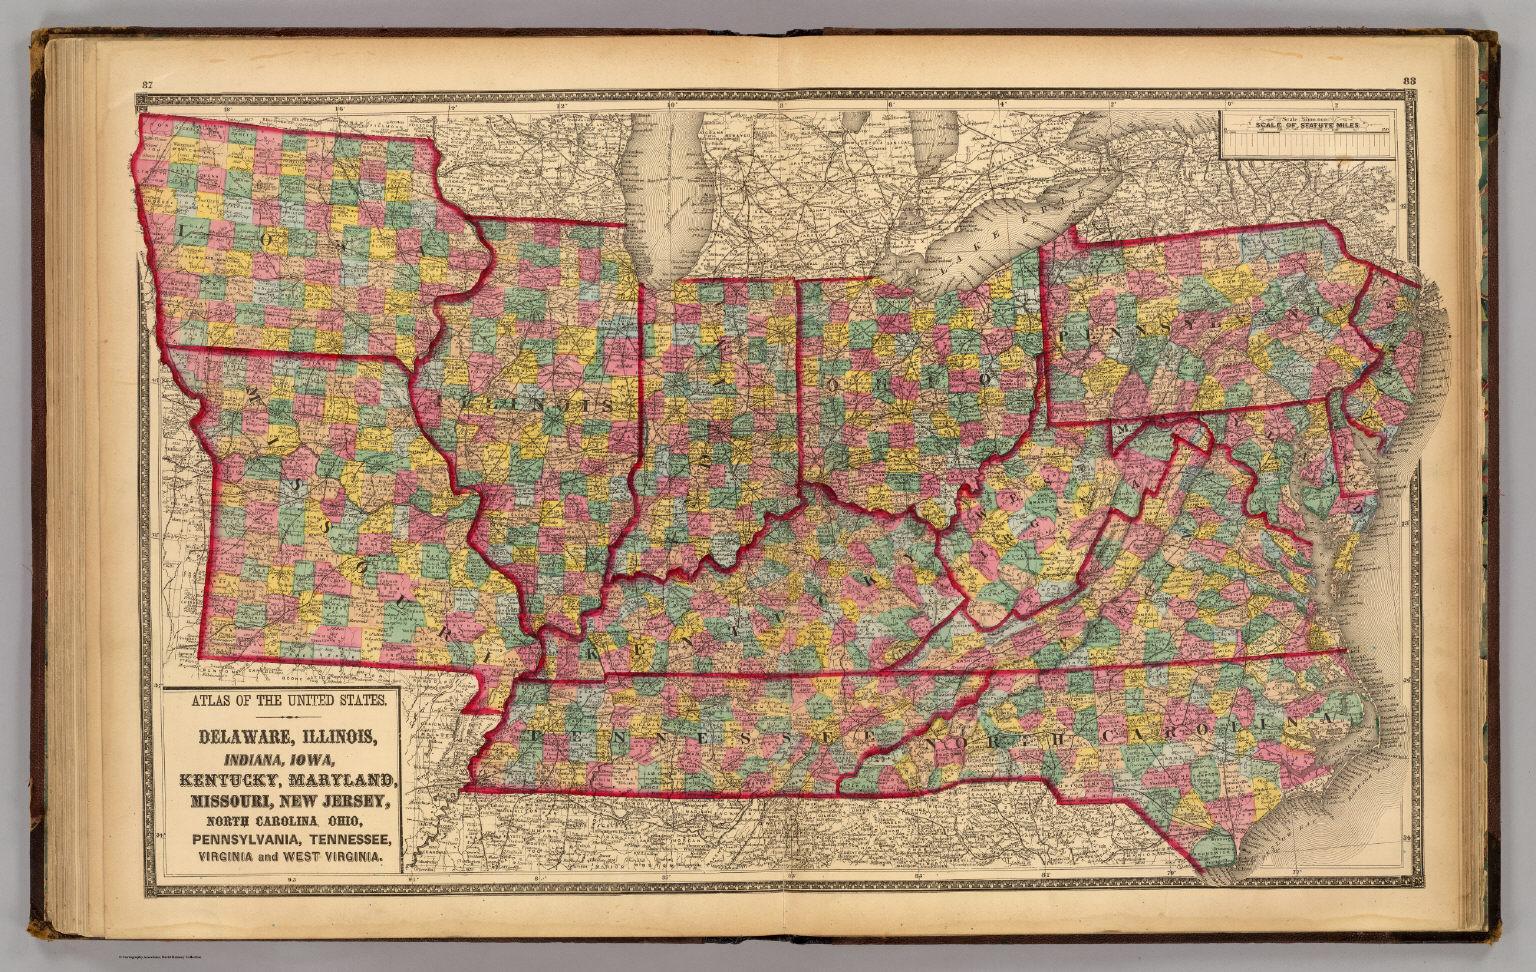 Delaware Illinois Indiana Iowa North Carolina Tennessee